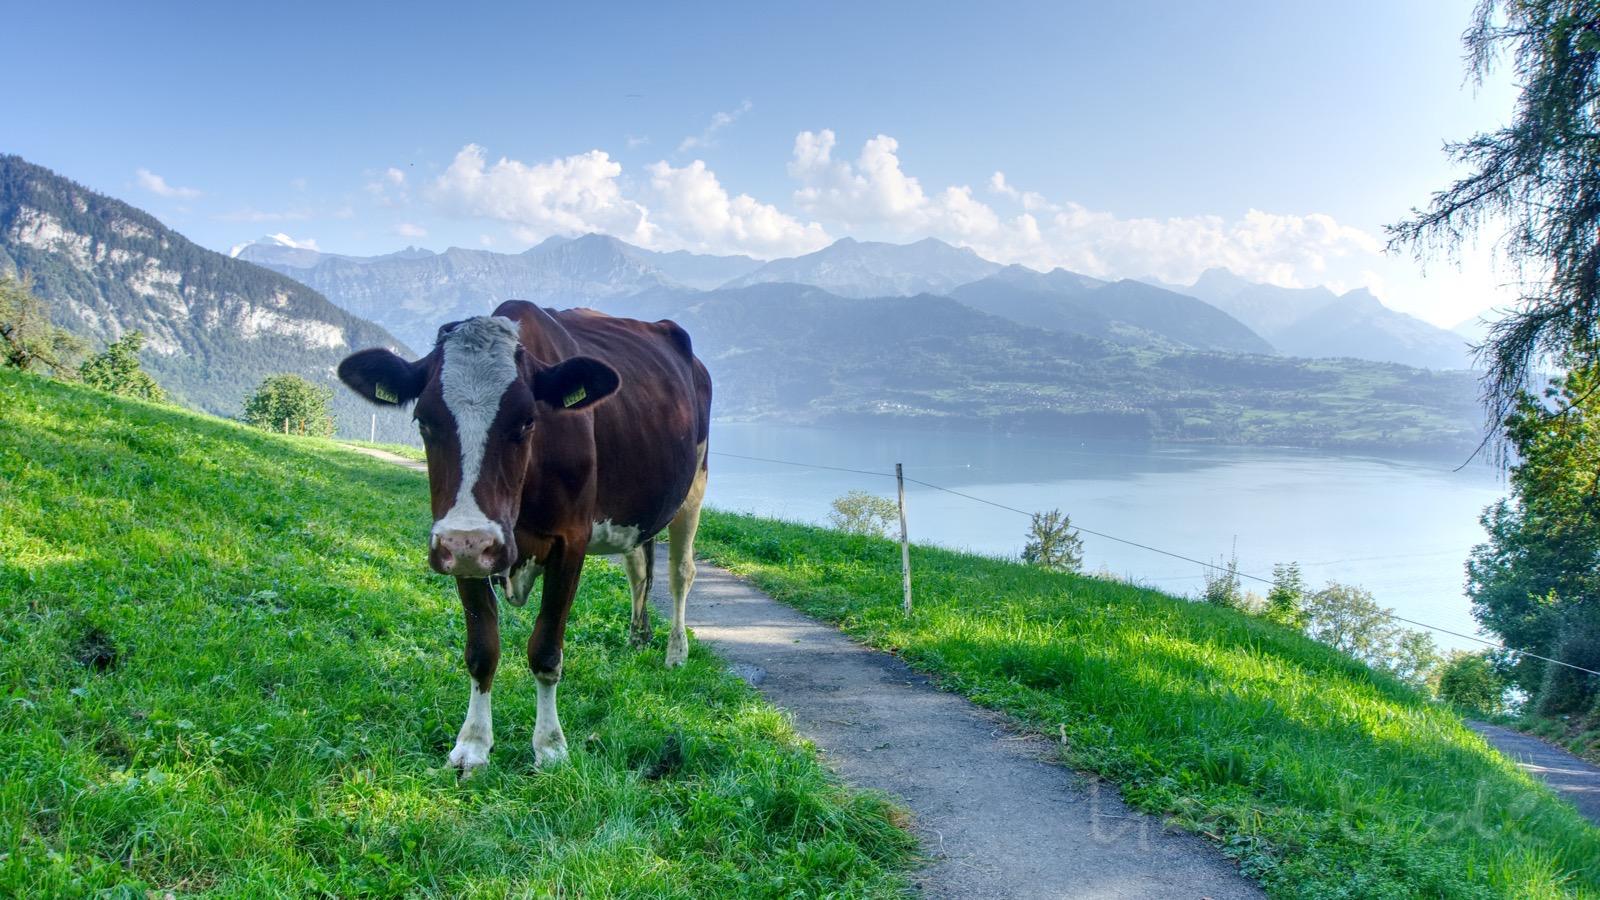 Freundliche Kuh bei Sigriswil.